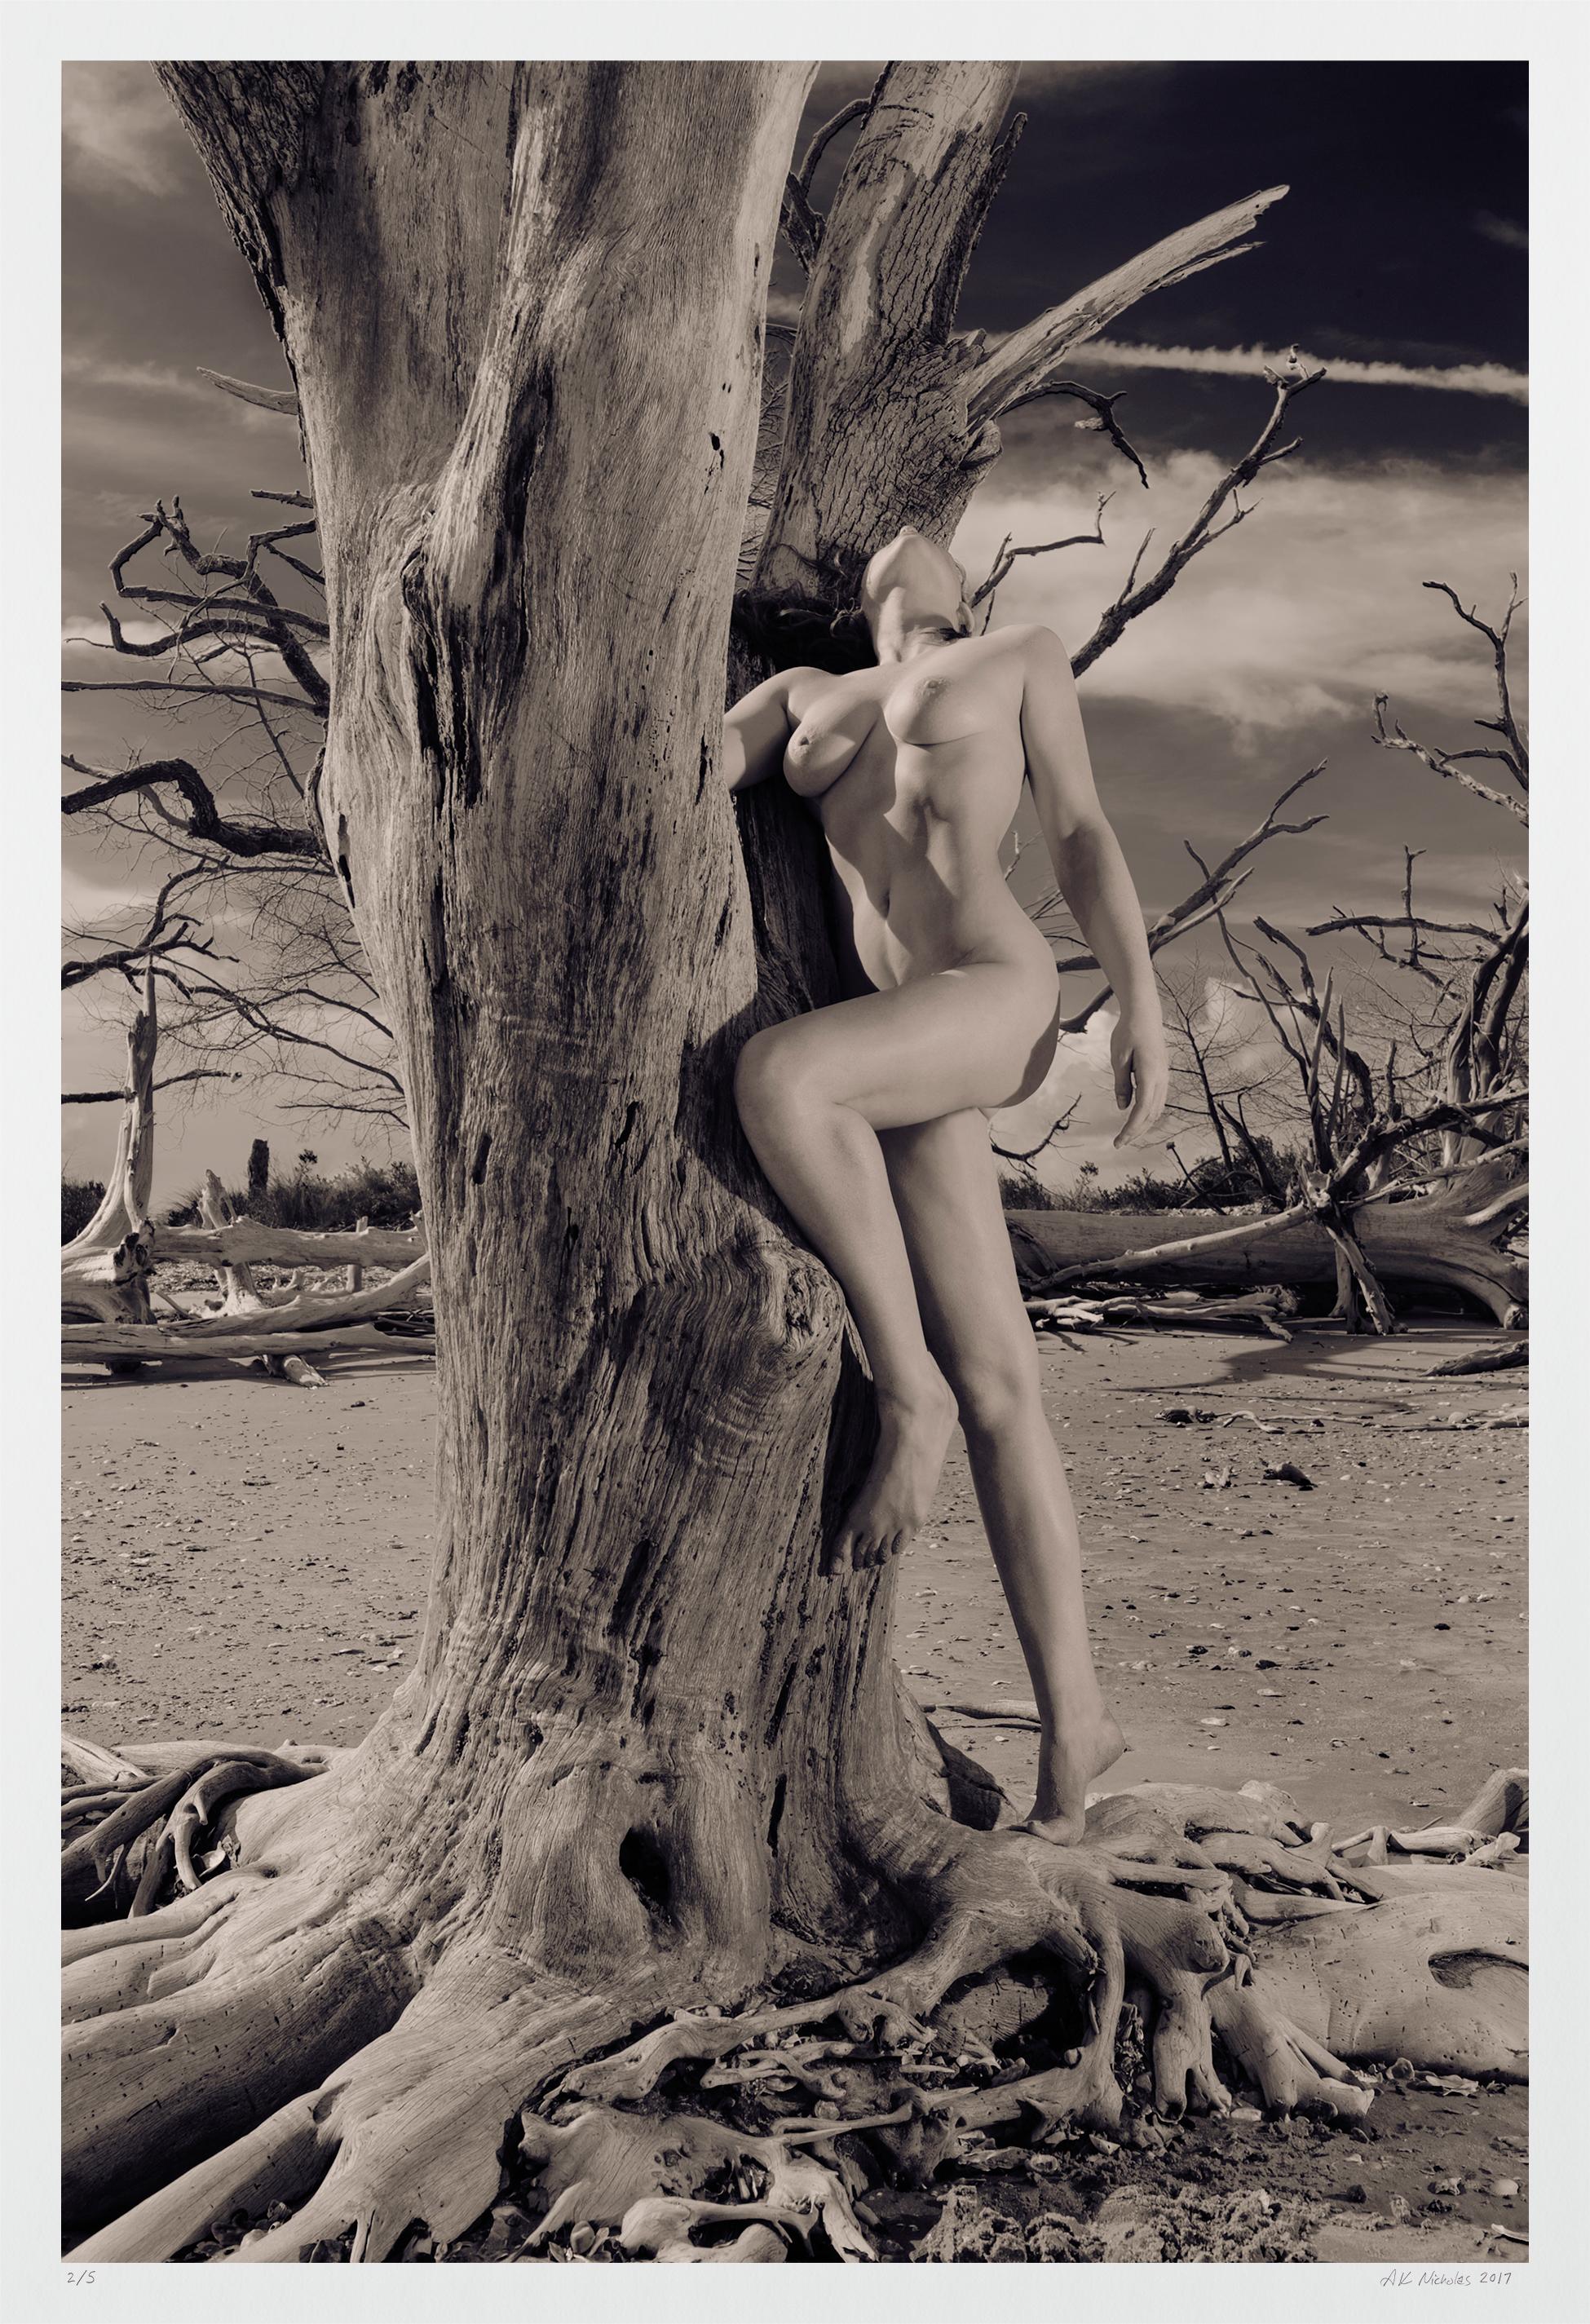 Artistic nude erotica